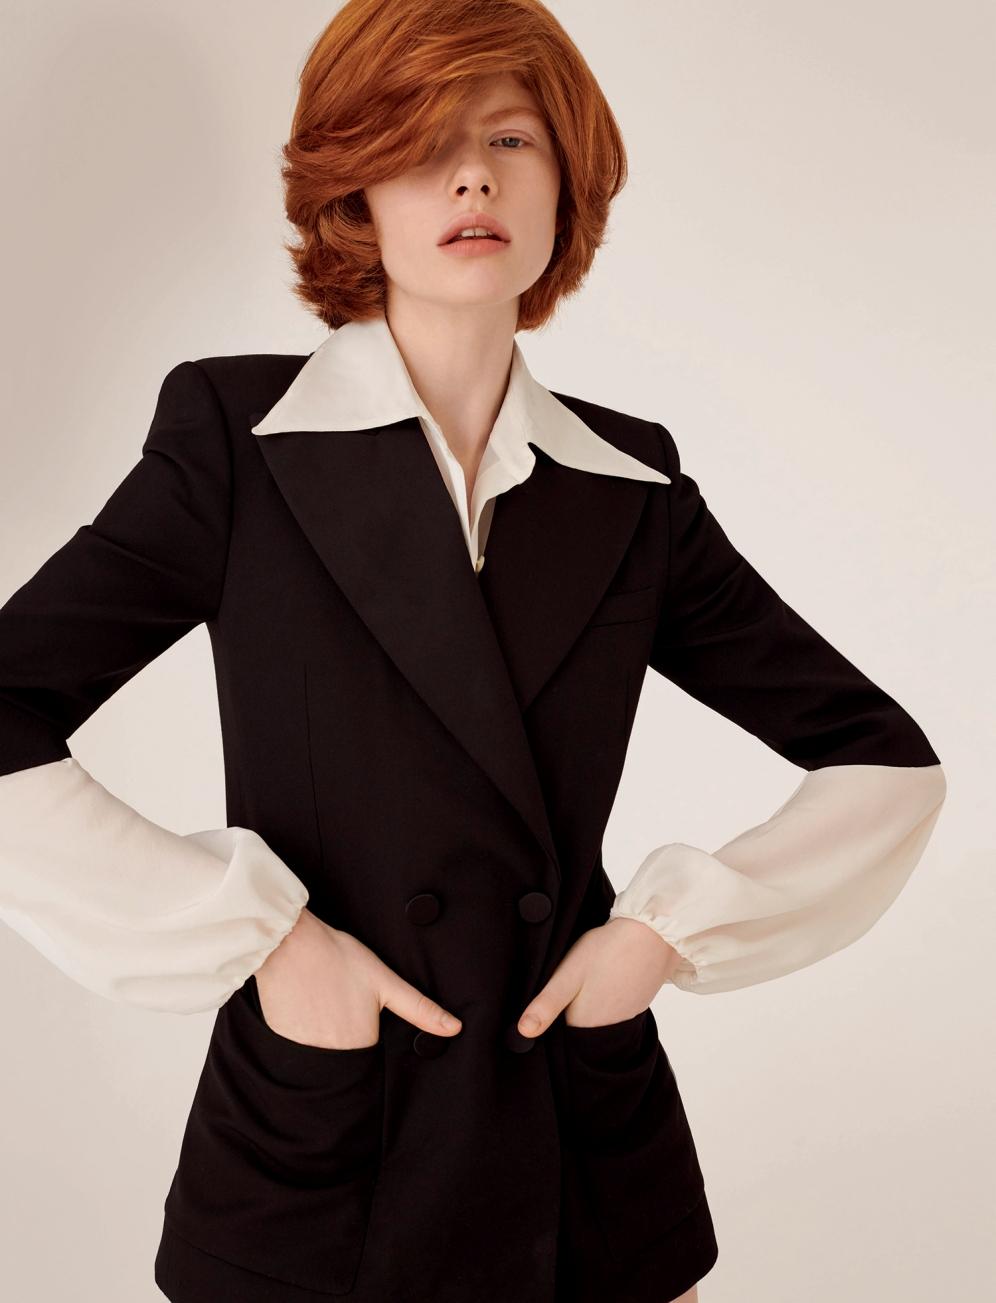 Edwina Preston | Harper's Bazaar Russia